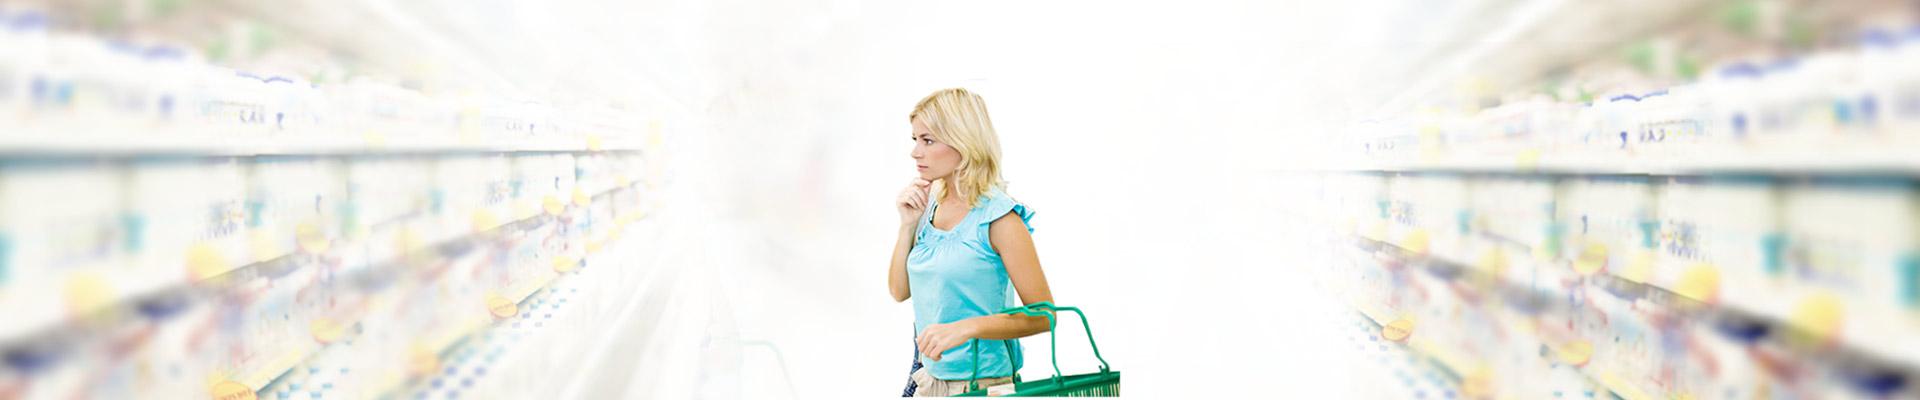 perfect-shelf-consumer-packaged-goods-retail.jpg